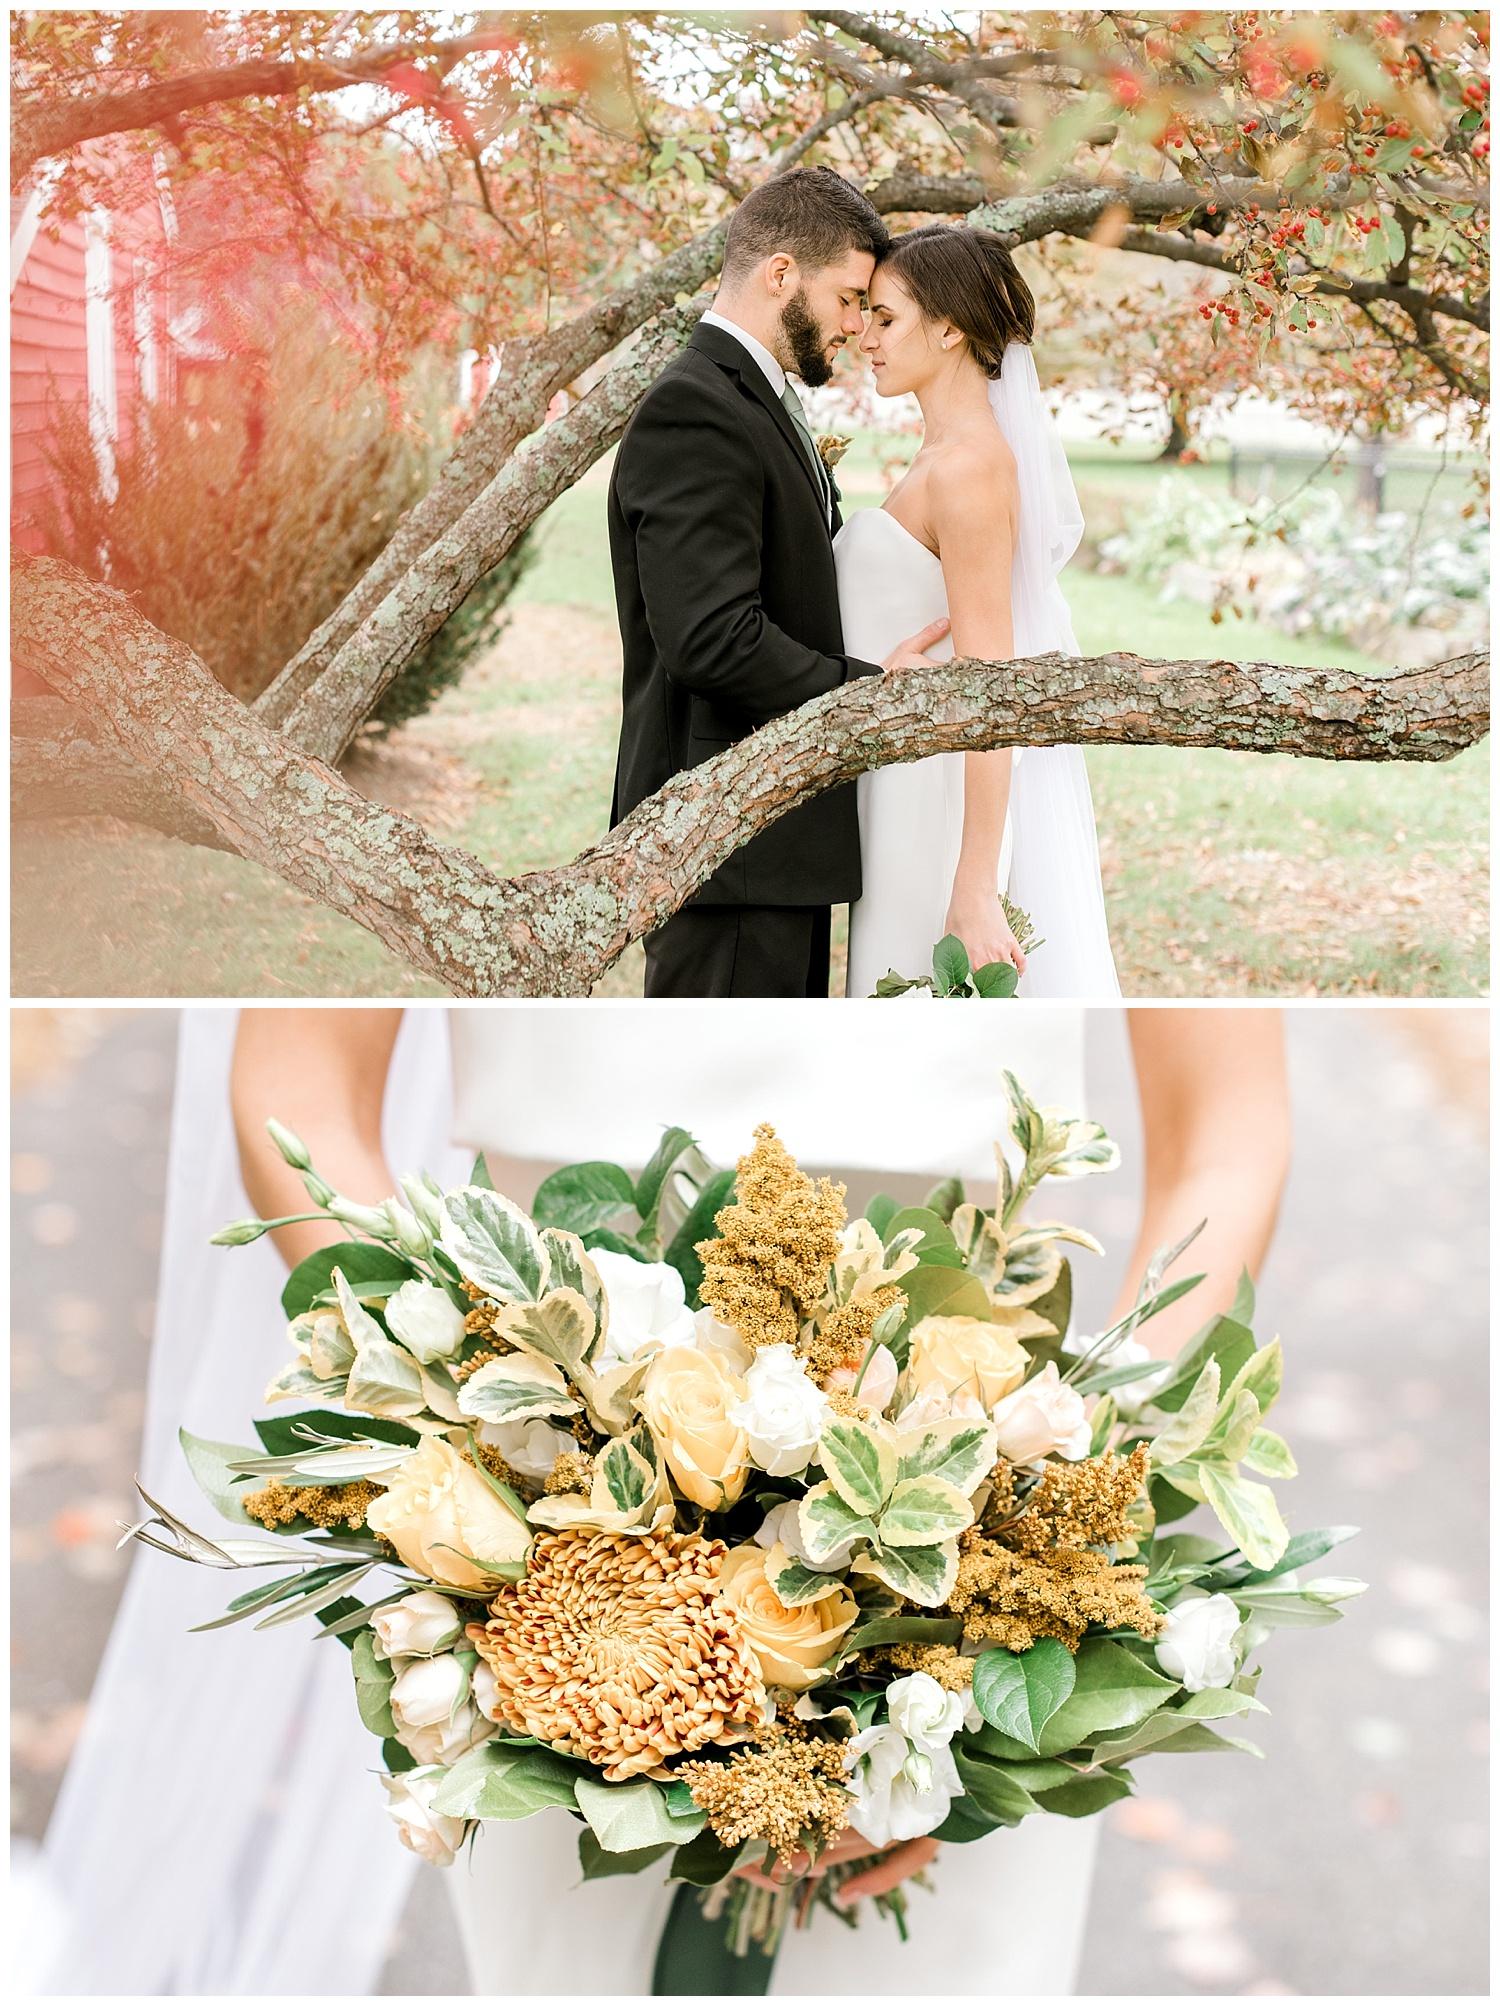 pompositticut-farm-fall-wedding-photography-hudson-massachusetts-photo-11.jpg